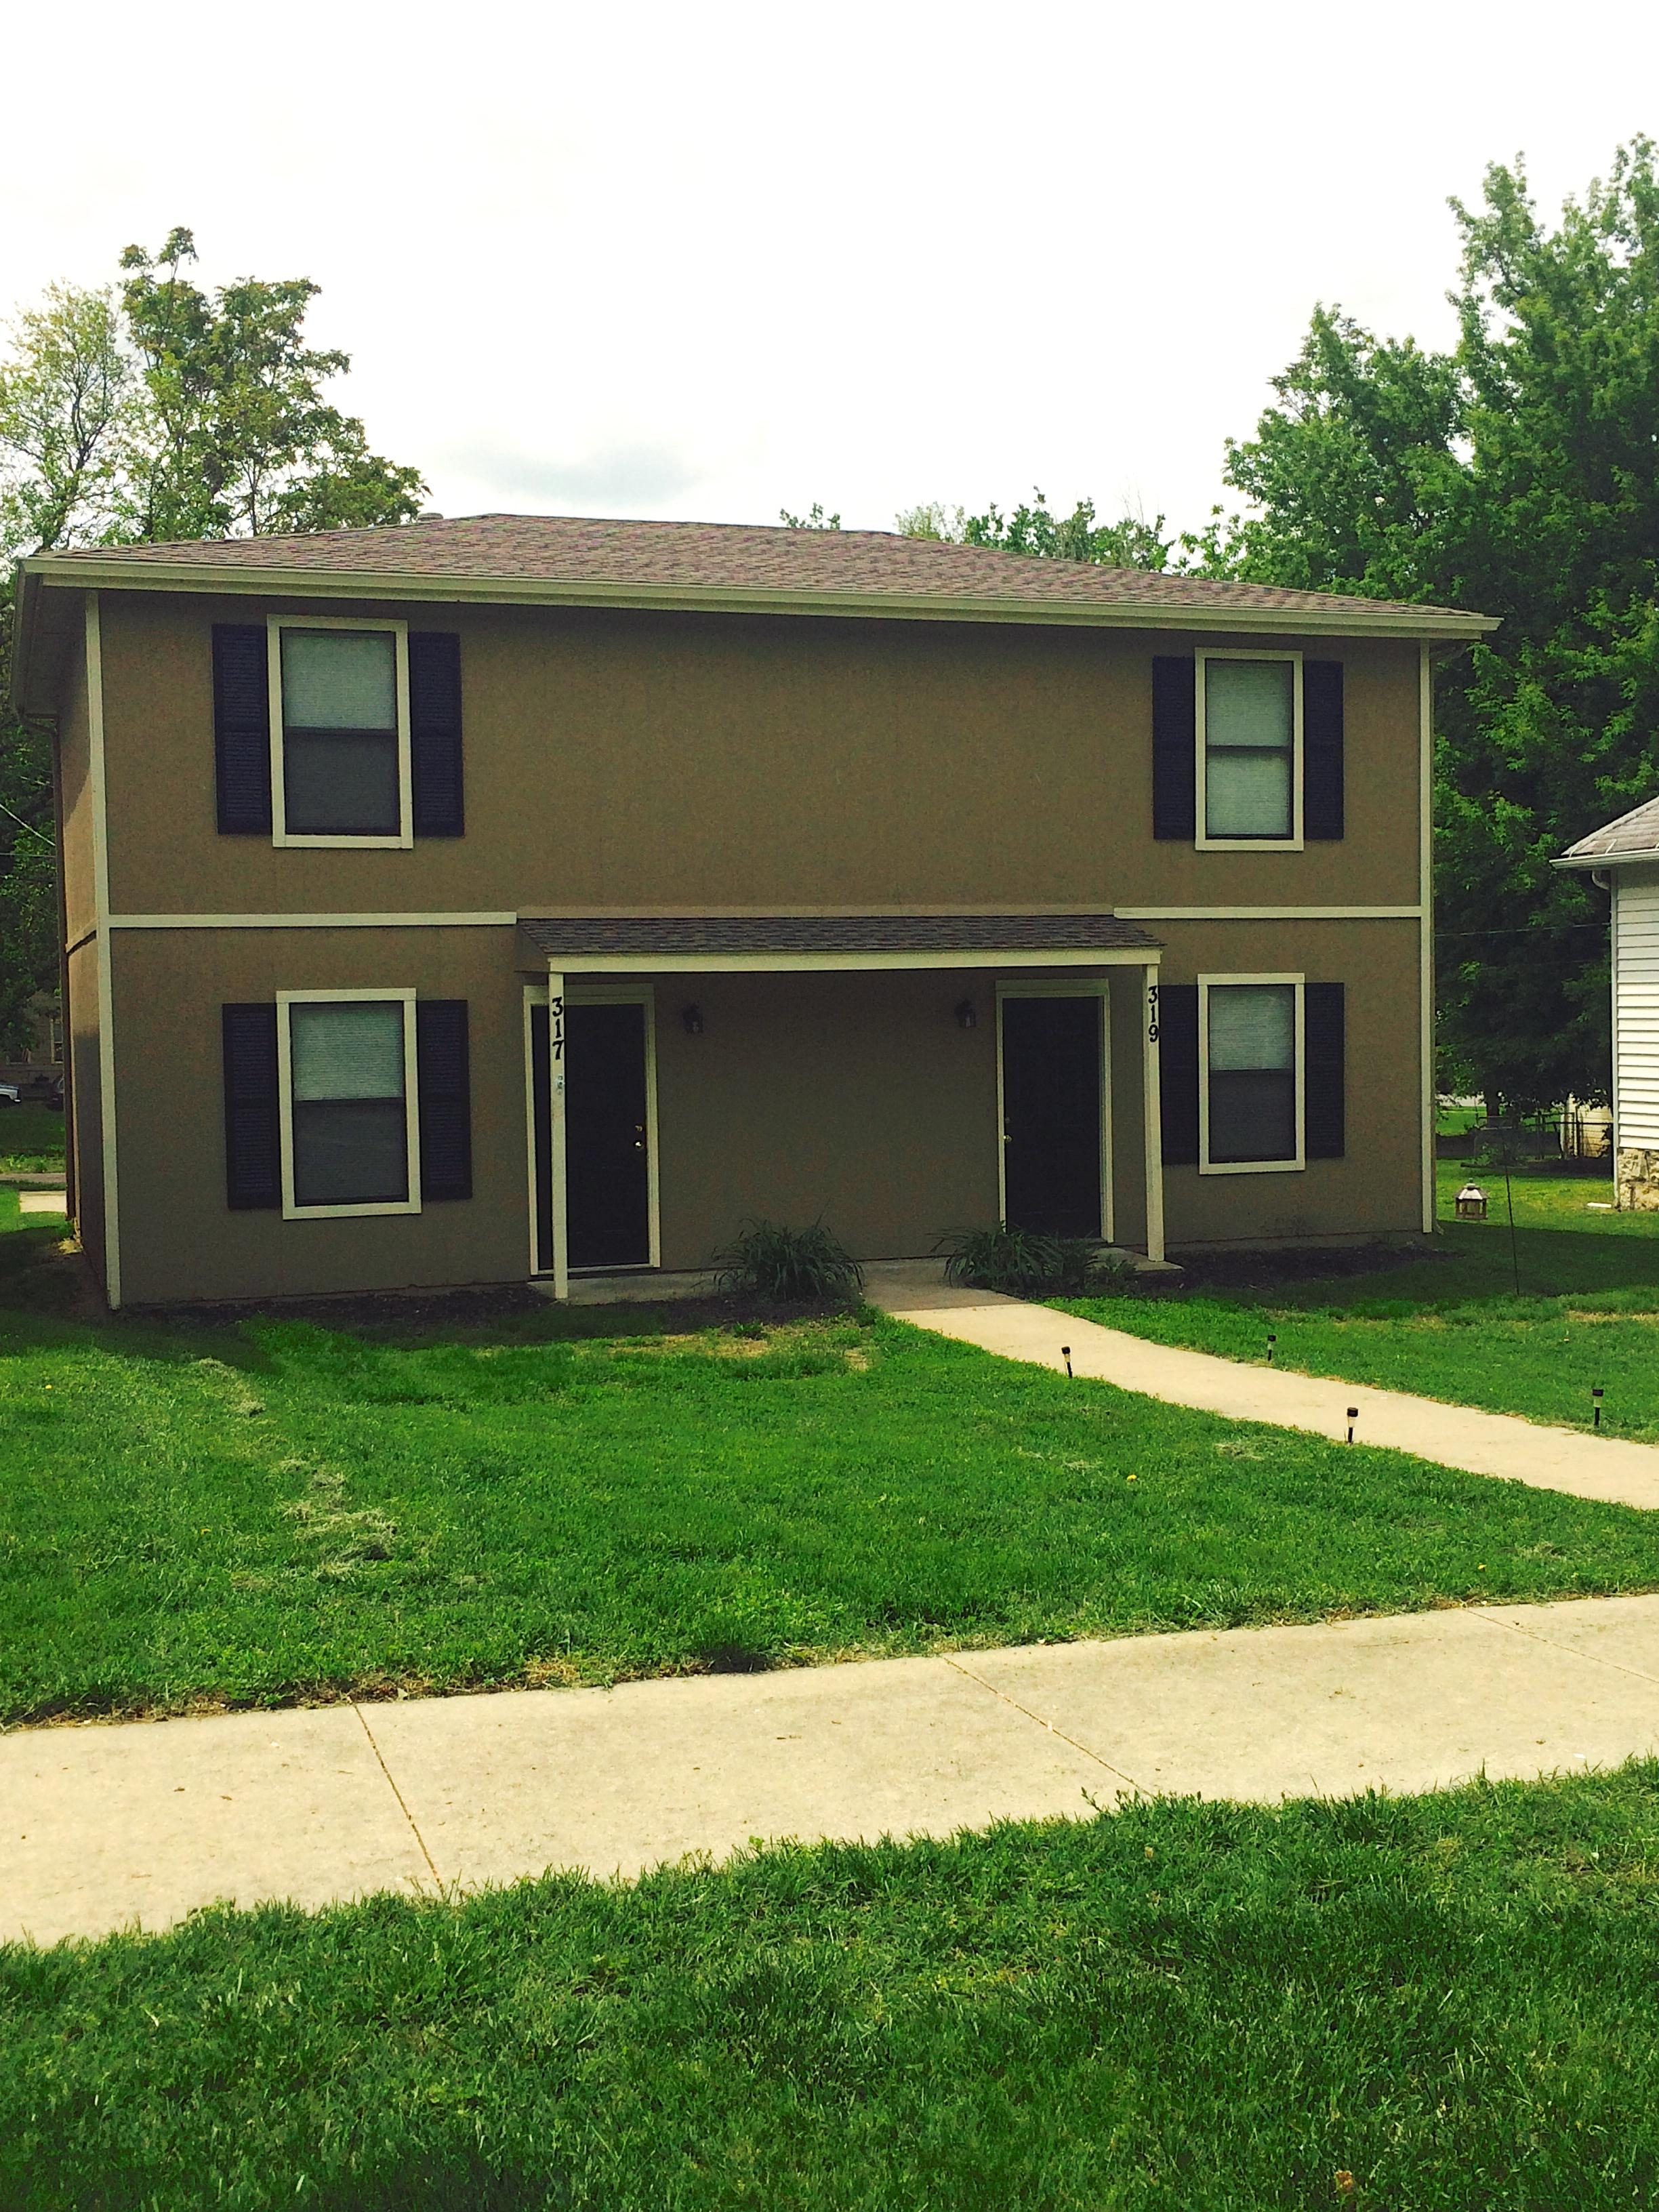 Bedroom Homes For Rent In Leavenworth Ks